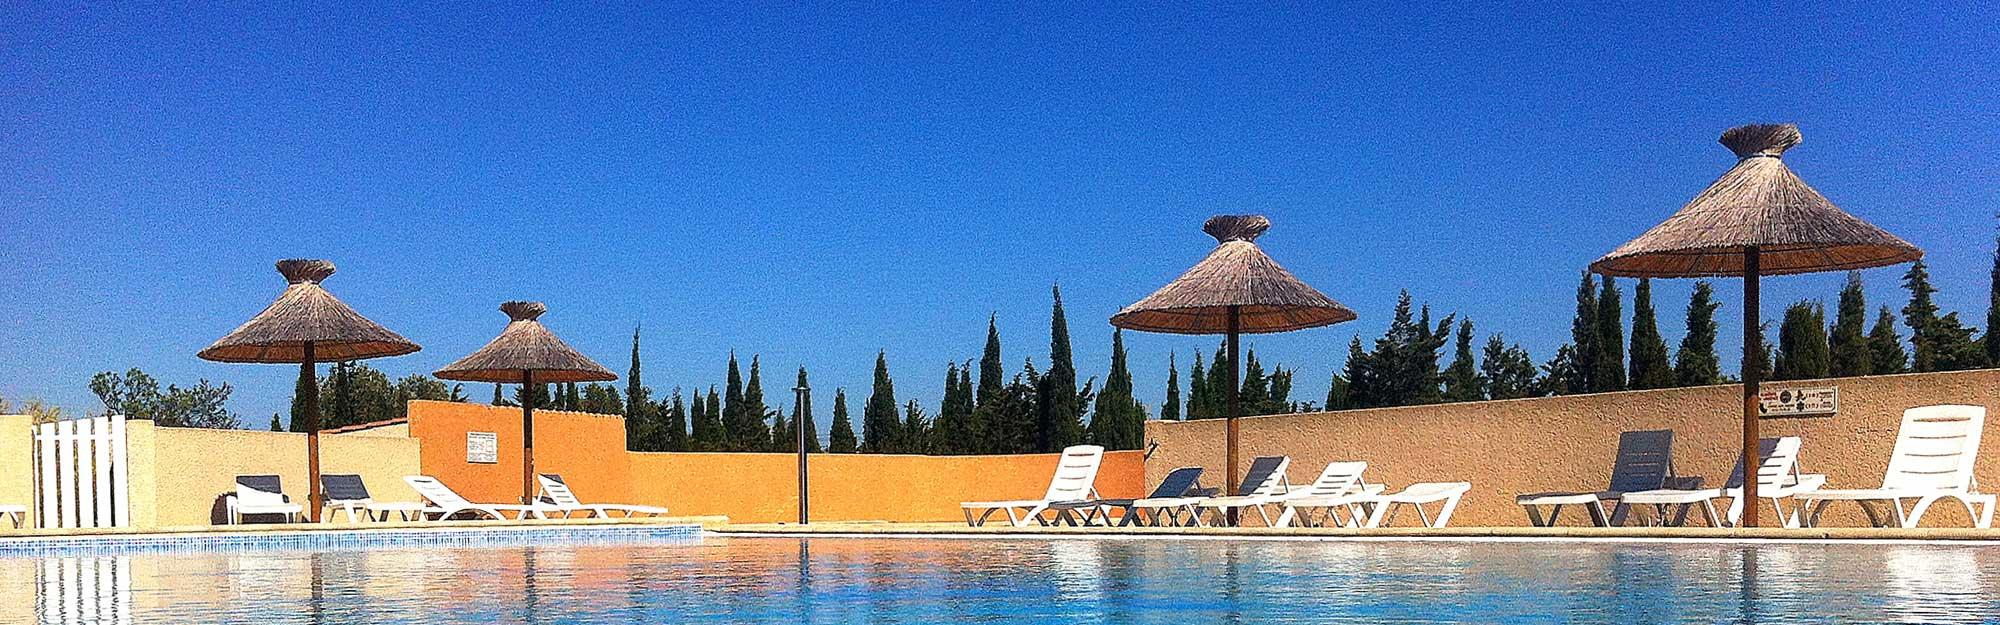 Camping Aude Avec Piscine | Camping Le Fun 3 Étoiles Leucate ... serapportantà Camping Aude Avec Piscine